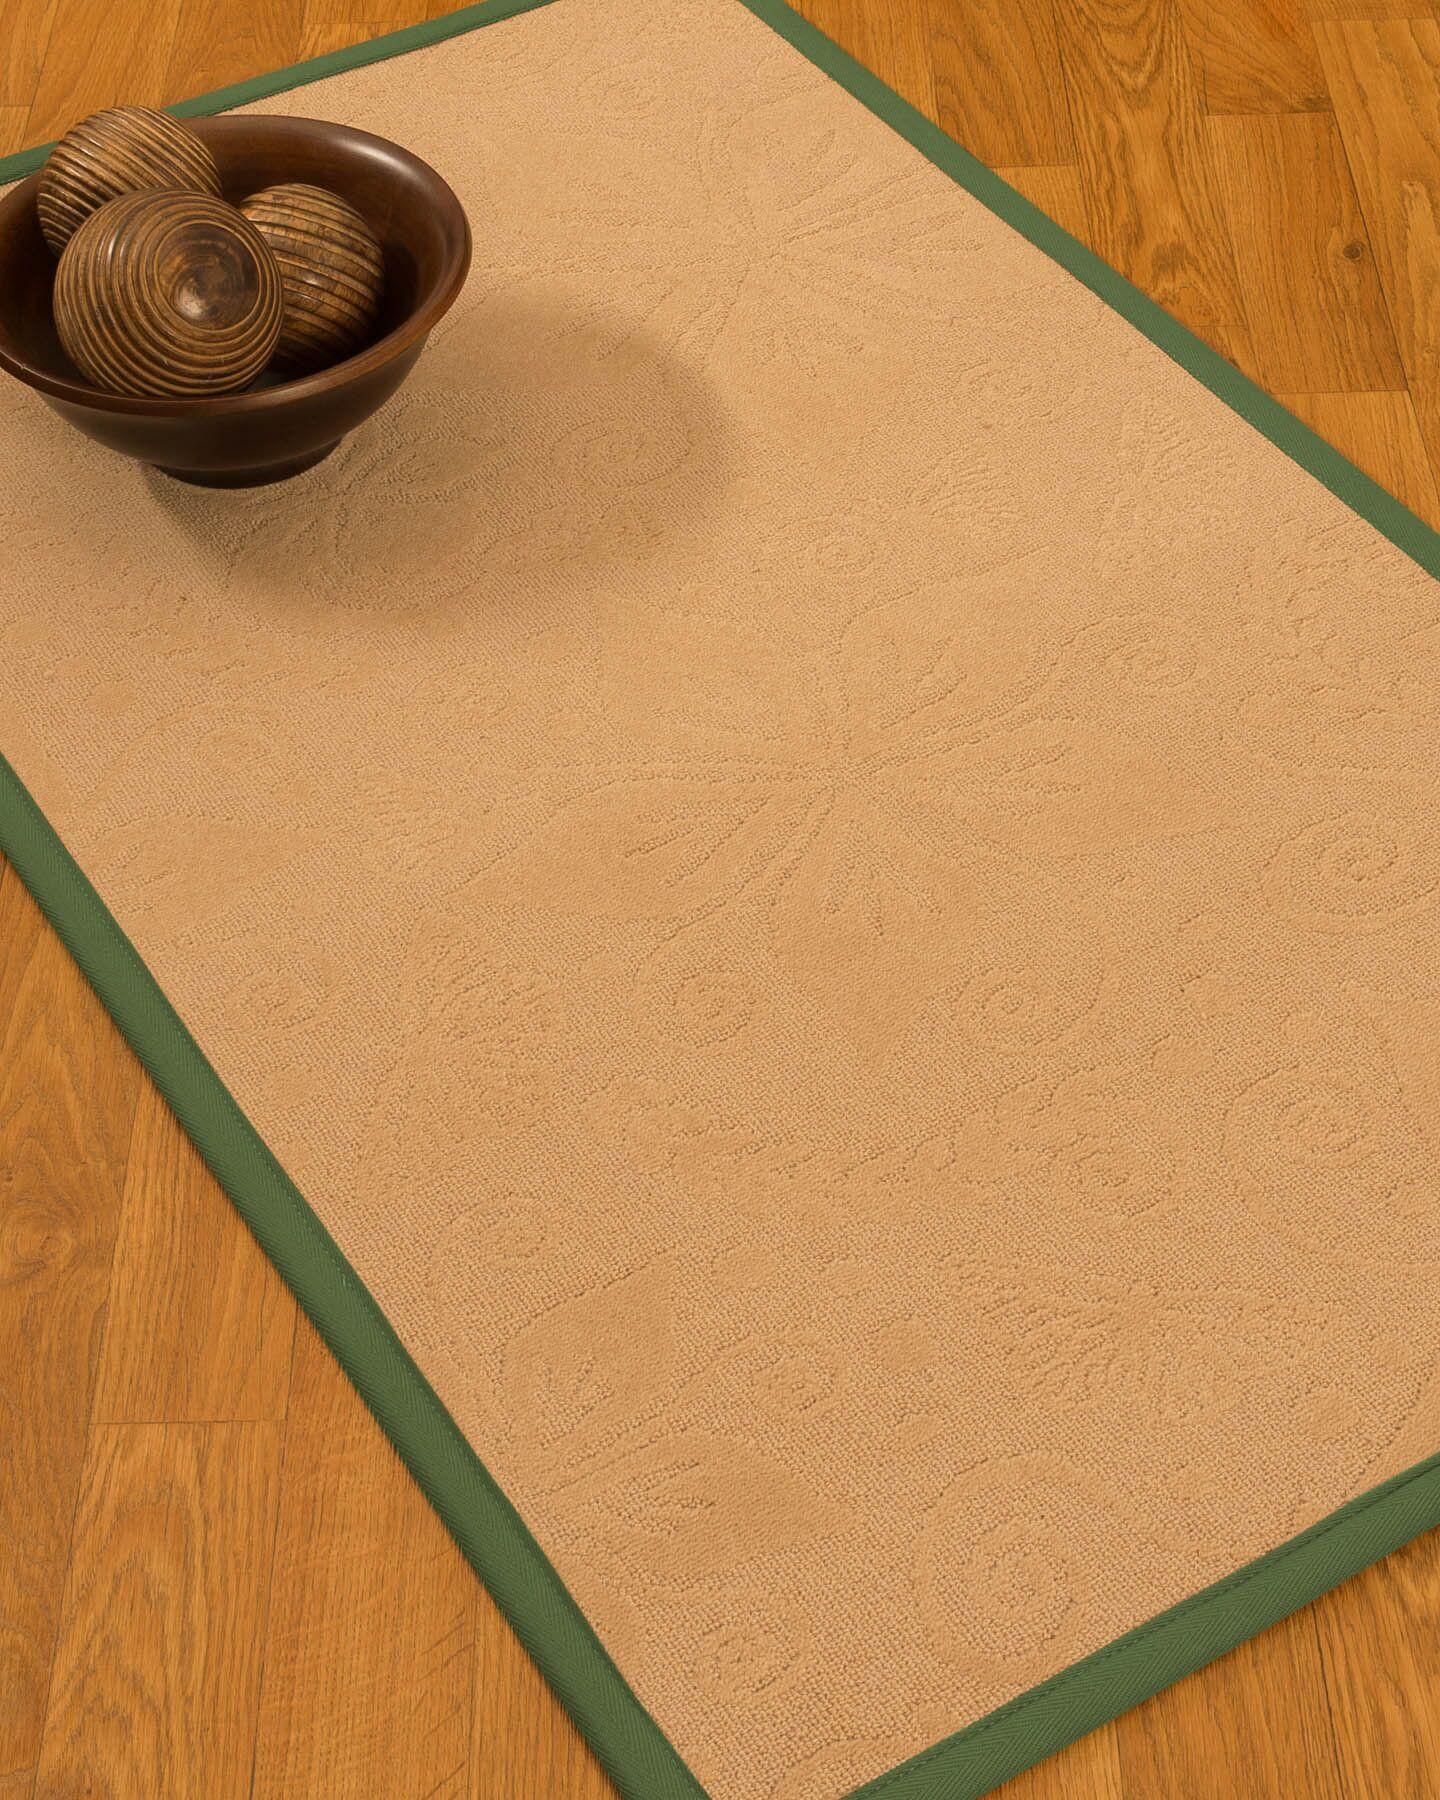 Vanmeter Border Hand-Woven Wool Beige/Green Area Rug Rug Pad Included: No, Rug Size: Runner 2'6